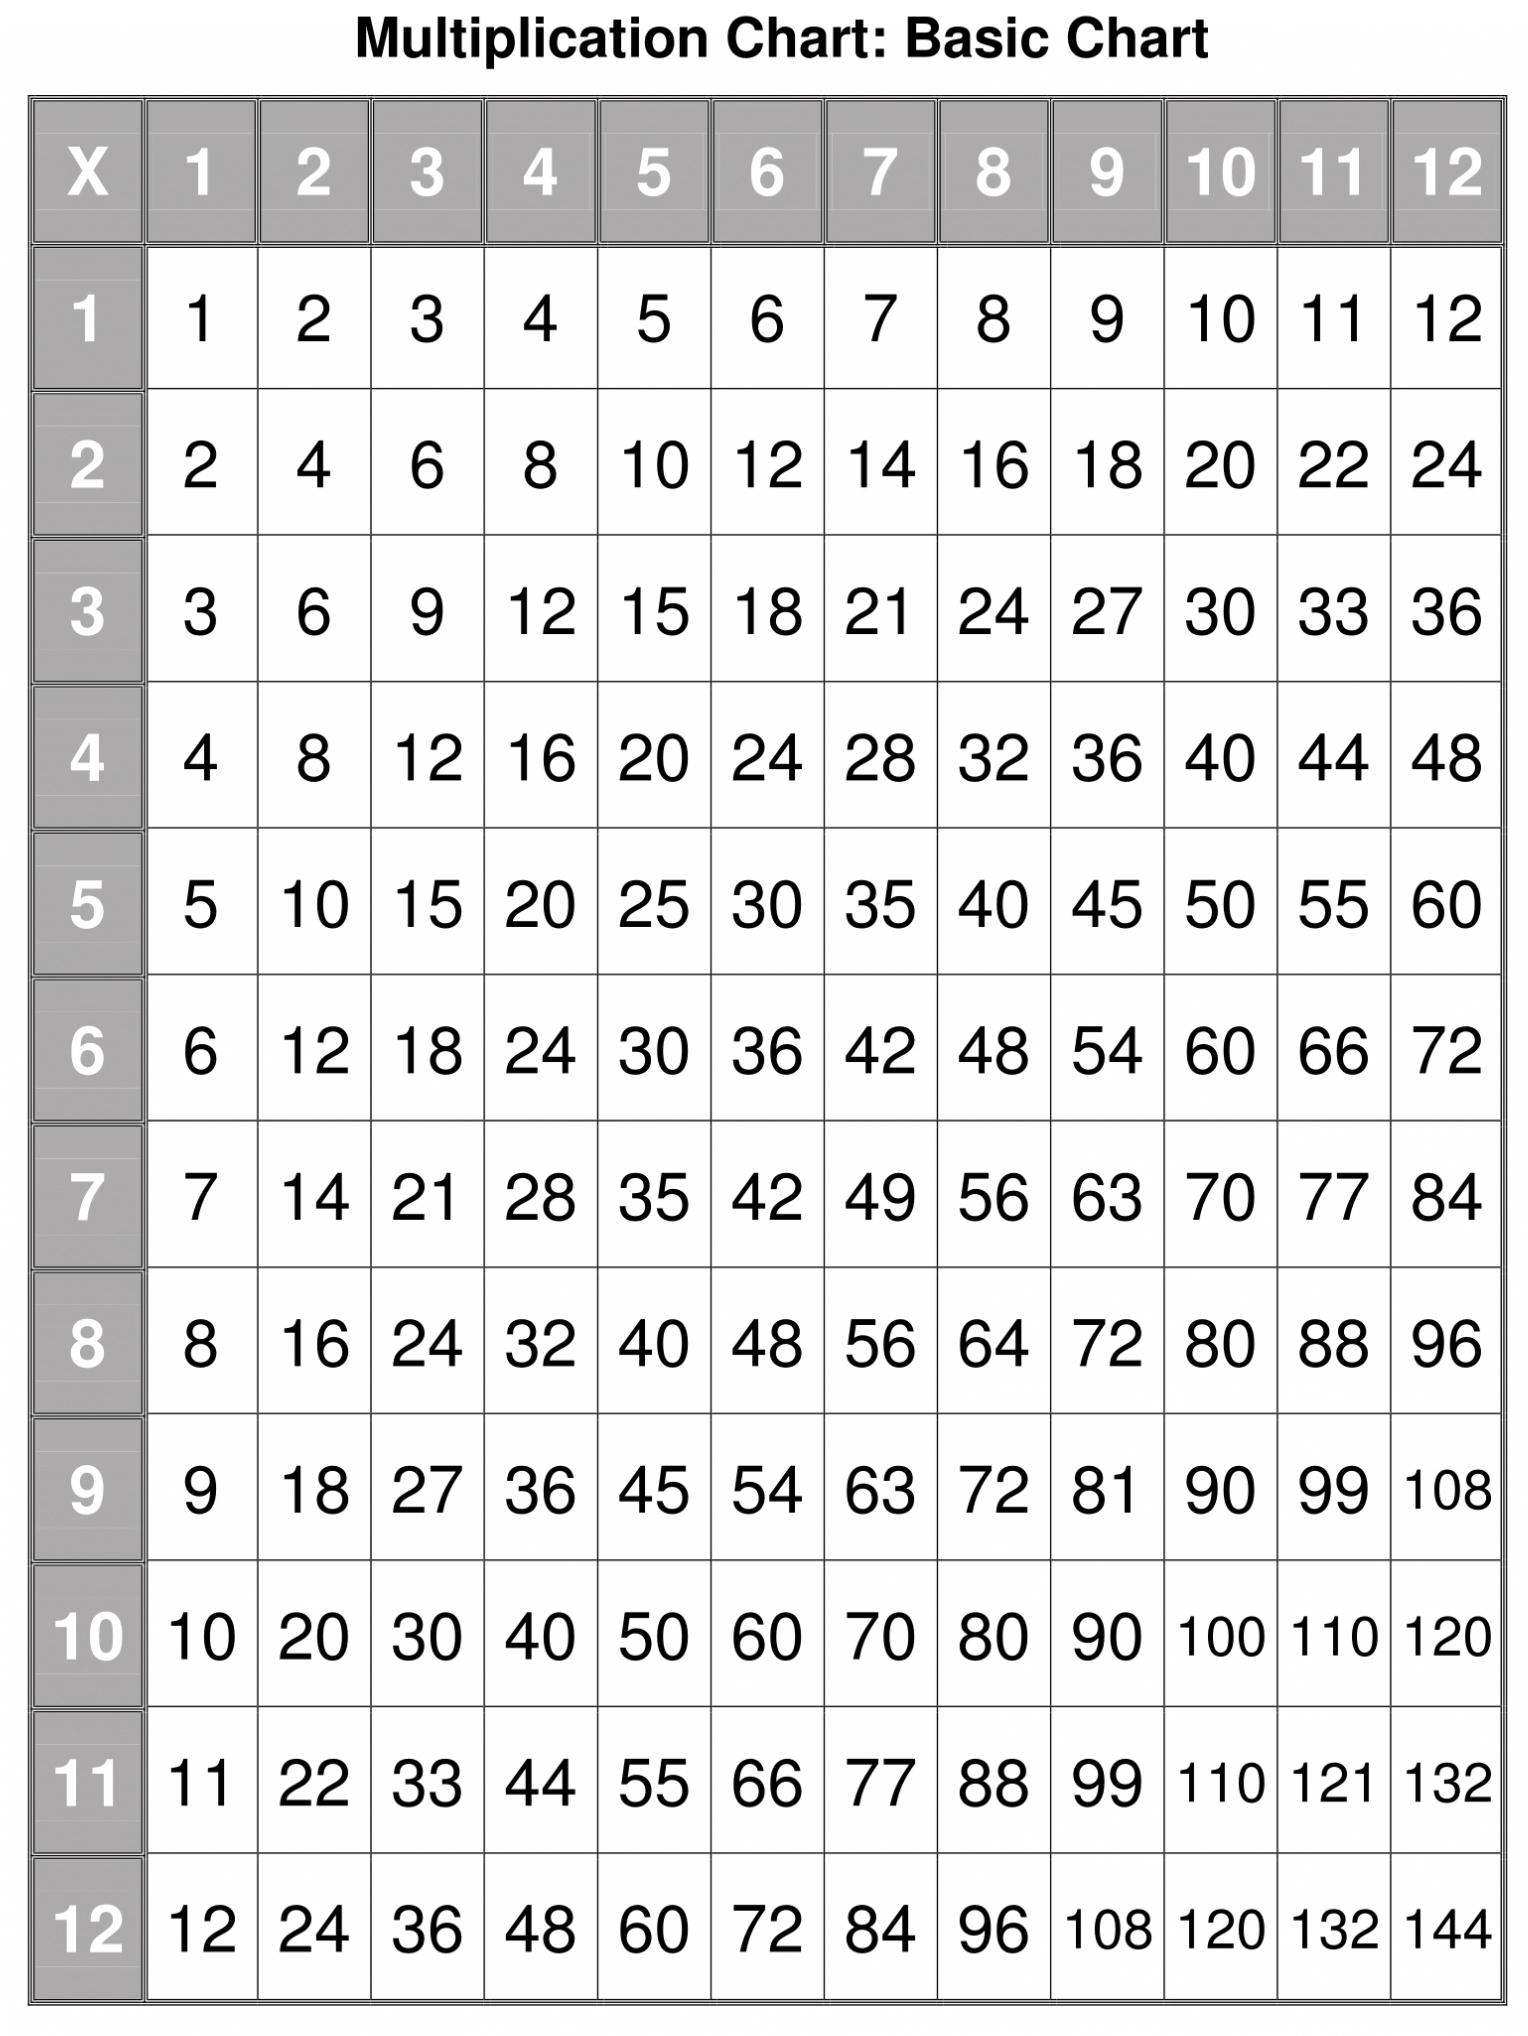 Printable Multiplication Table Pdf | Multiplication Charts in Printable Multiplication Table 1-12 Pdf